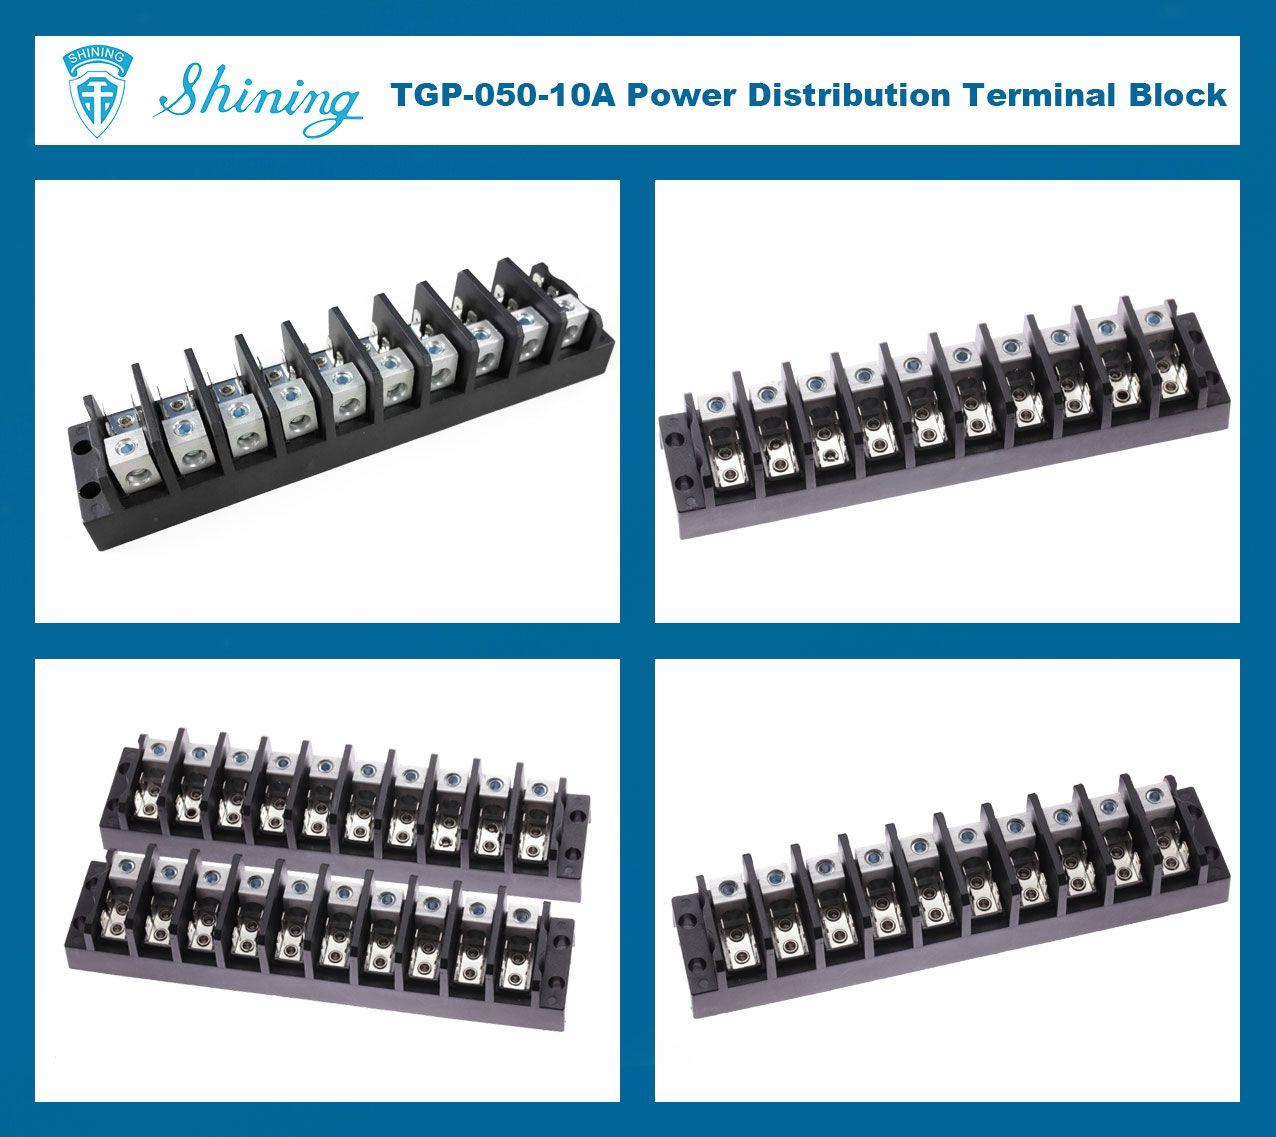 TGP-050-10A 600V 50A 10 Pole Electrical Power Terminal Block